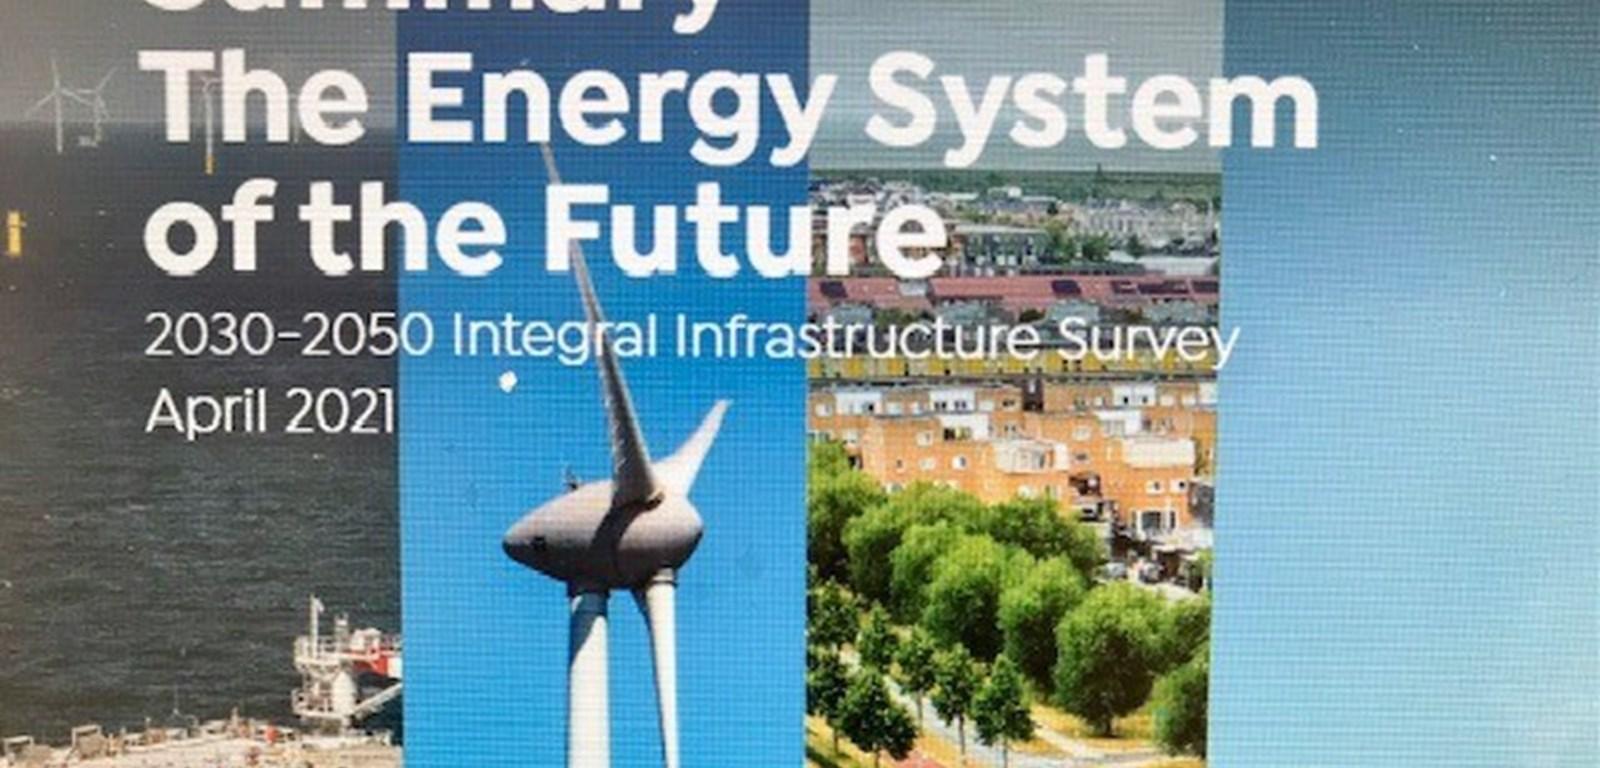 Vertaling beschikbaar: The Energy System of the Future